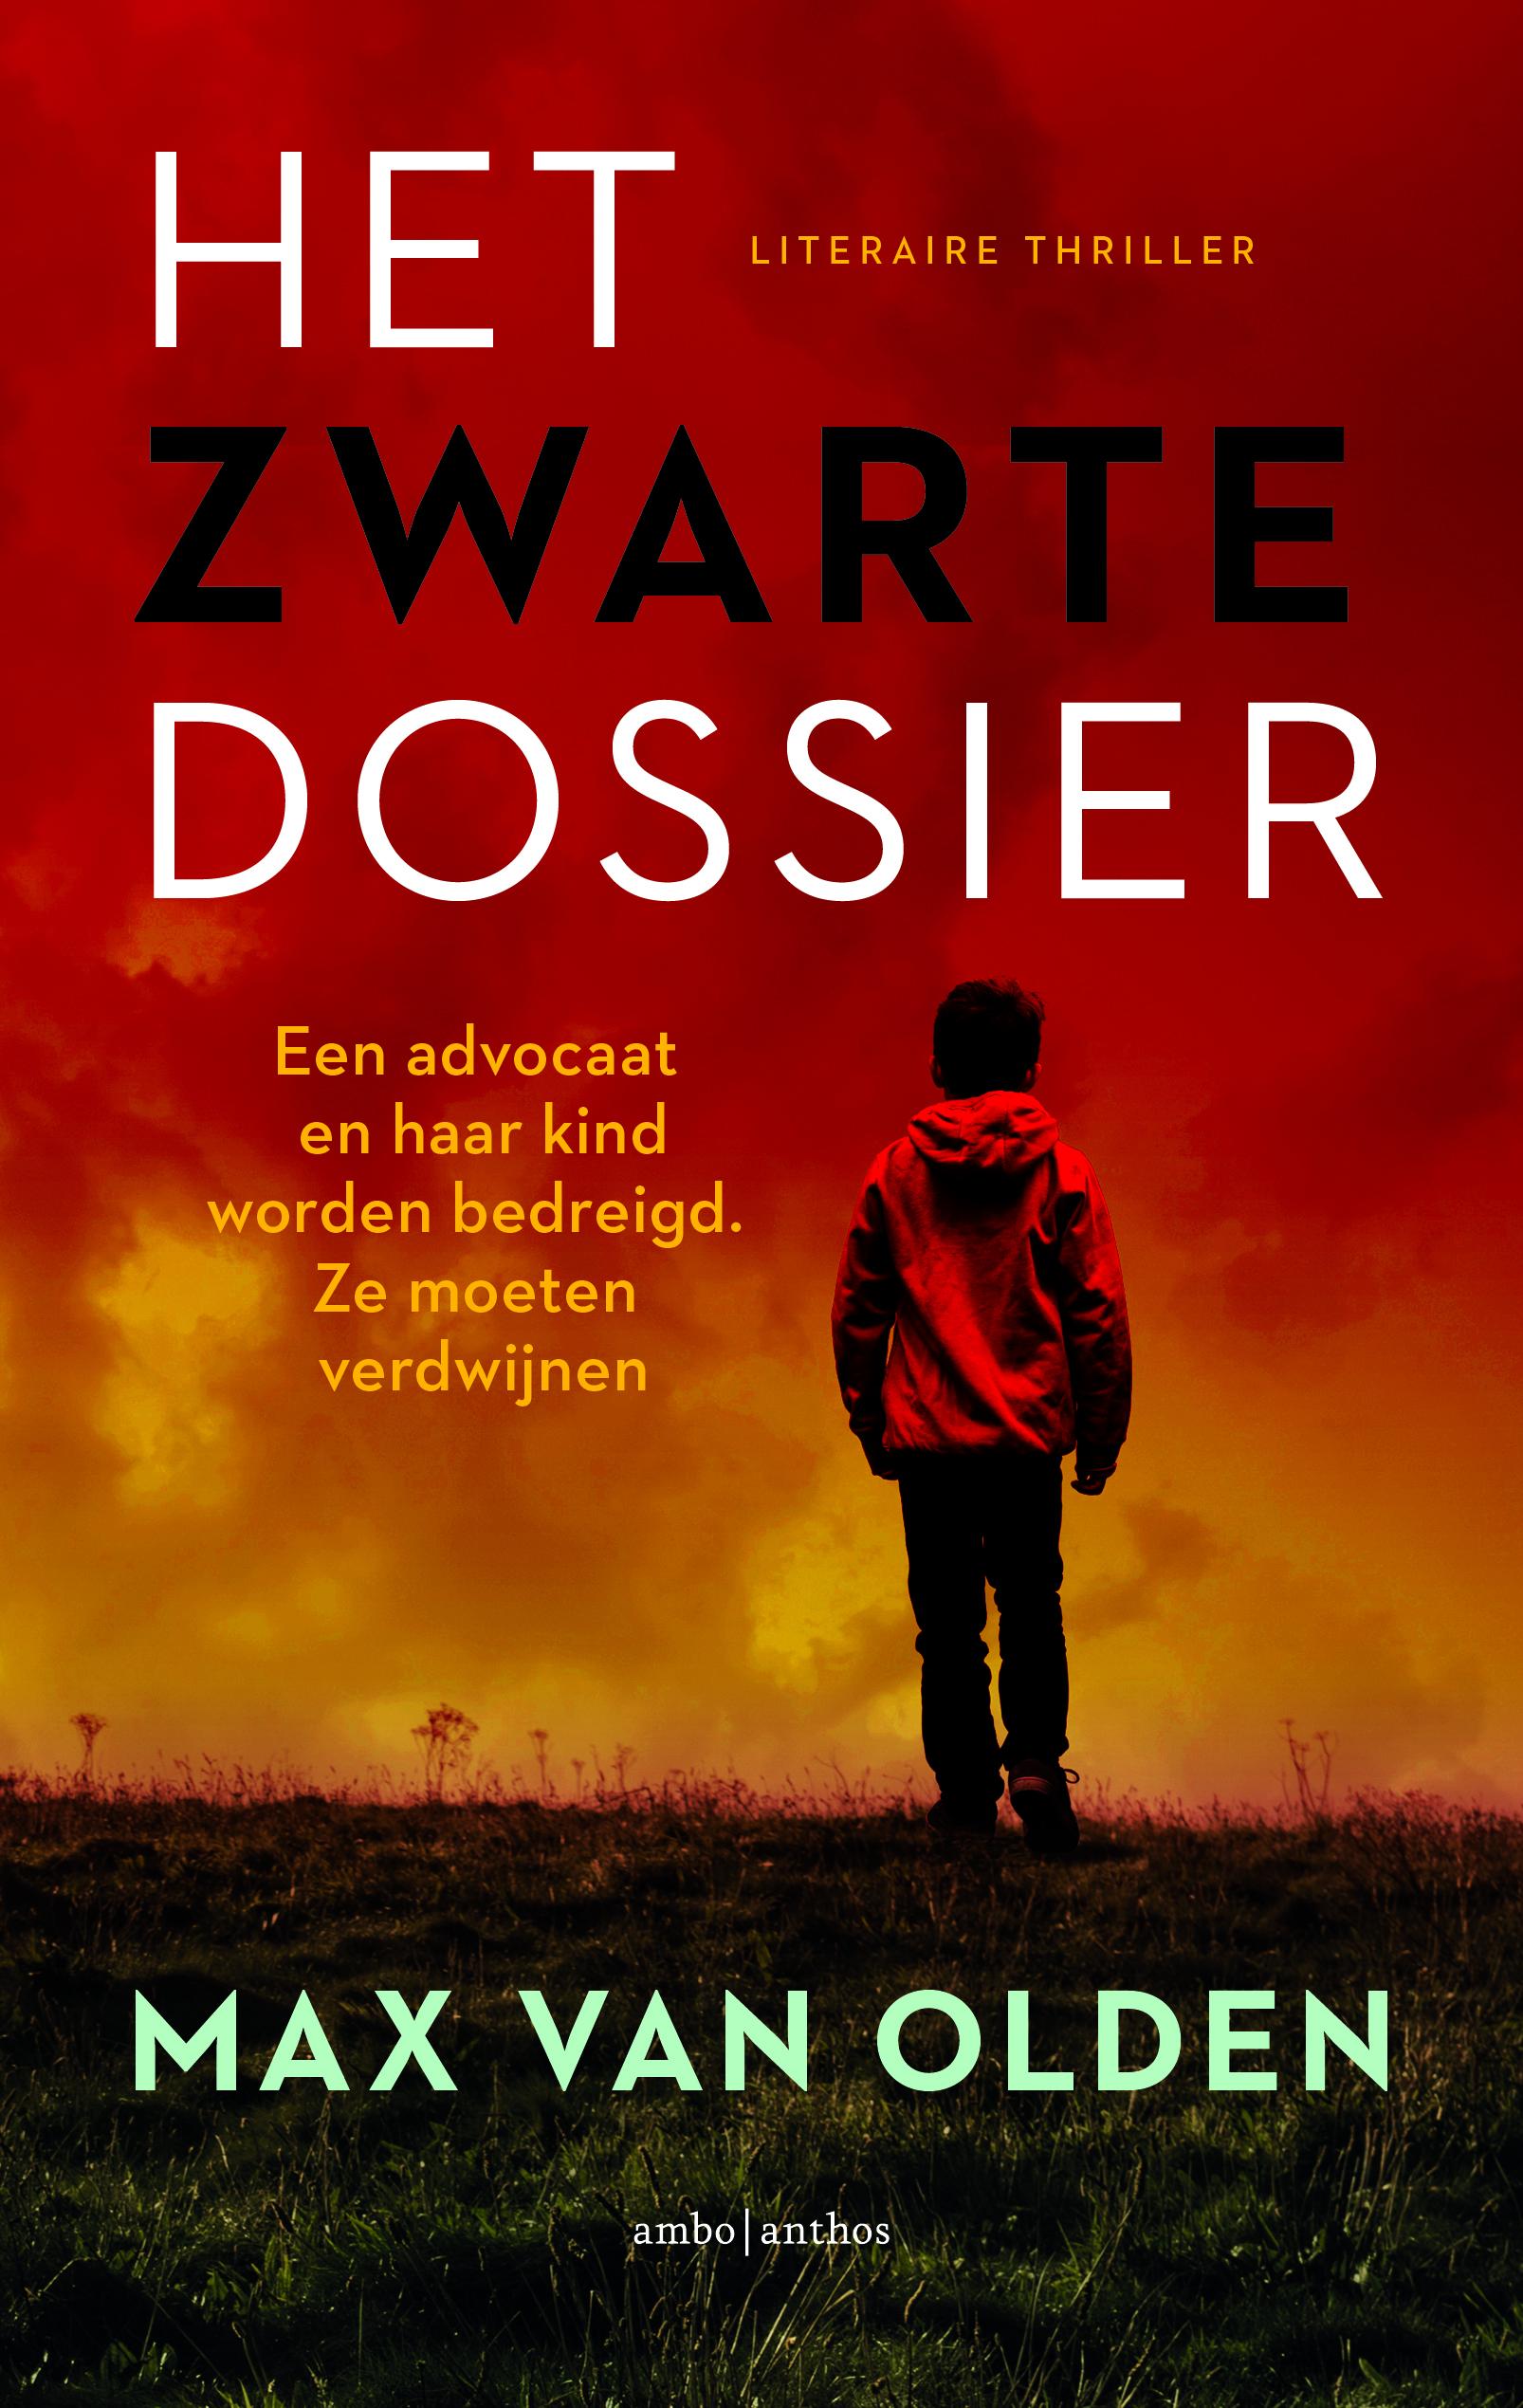 Het zwarte dossier - boekenflits.nl